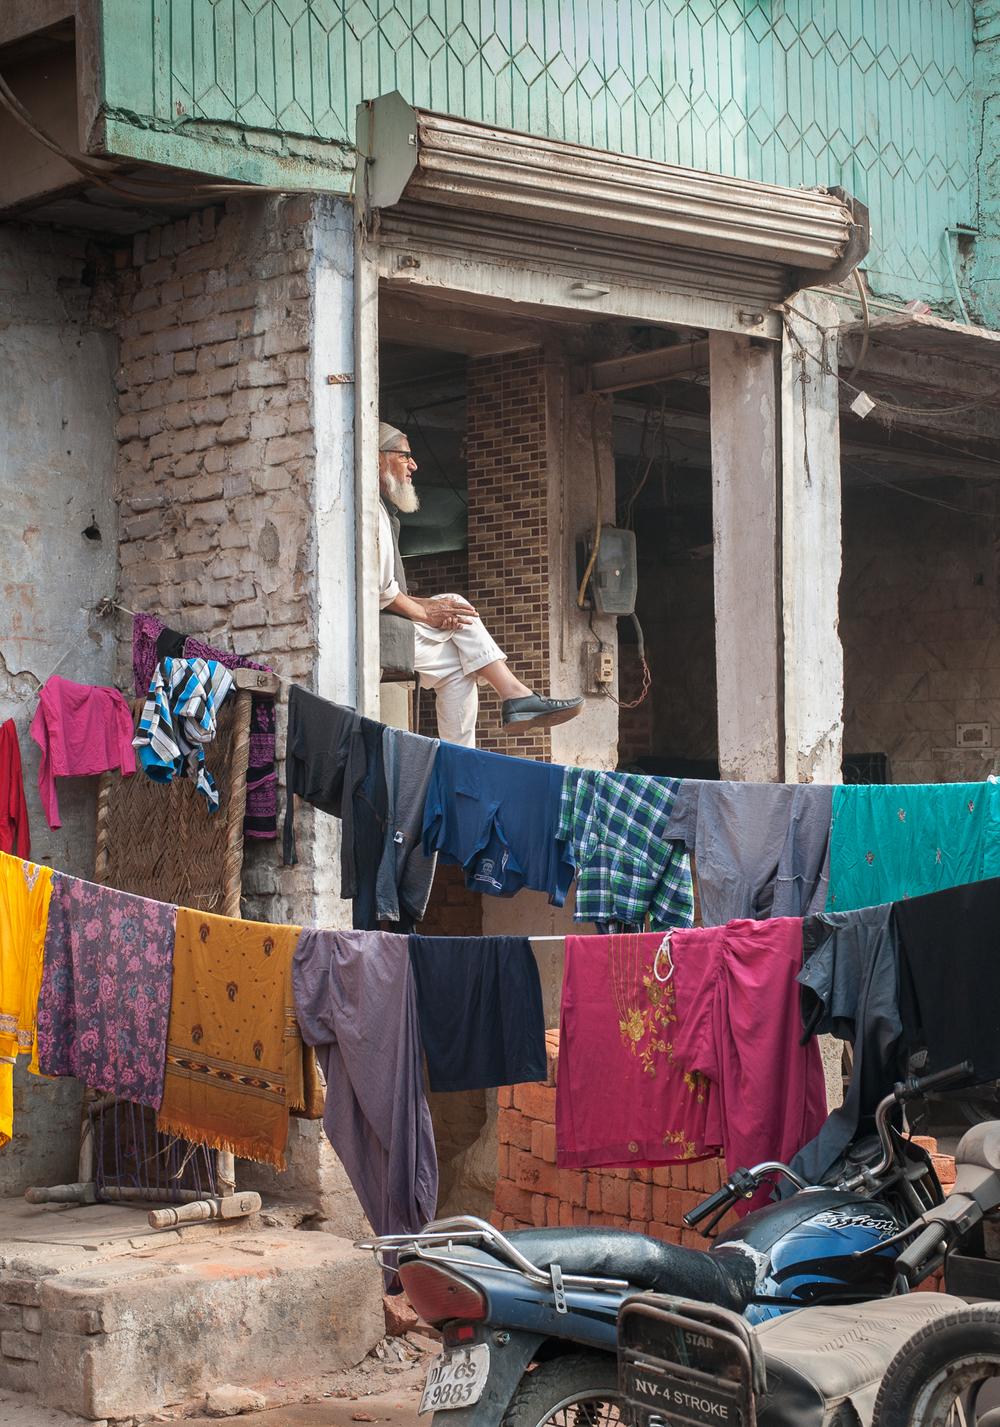 Delhi street-37.jpg